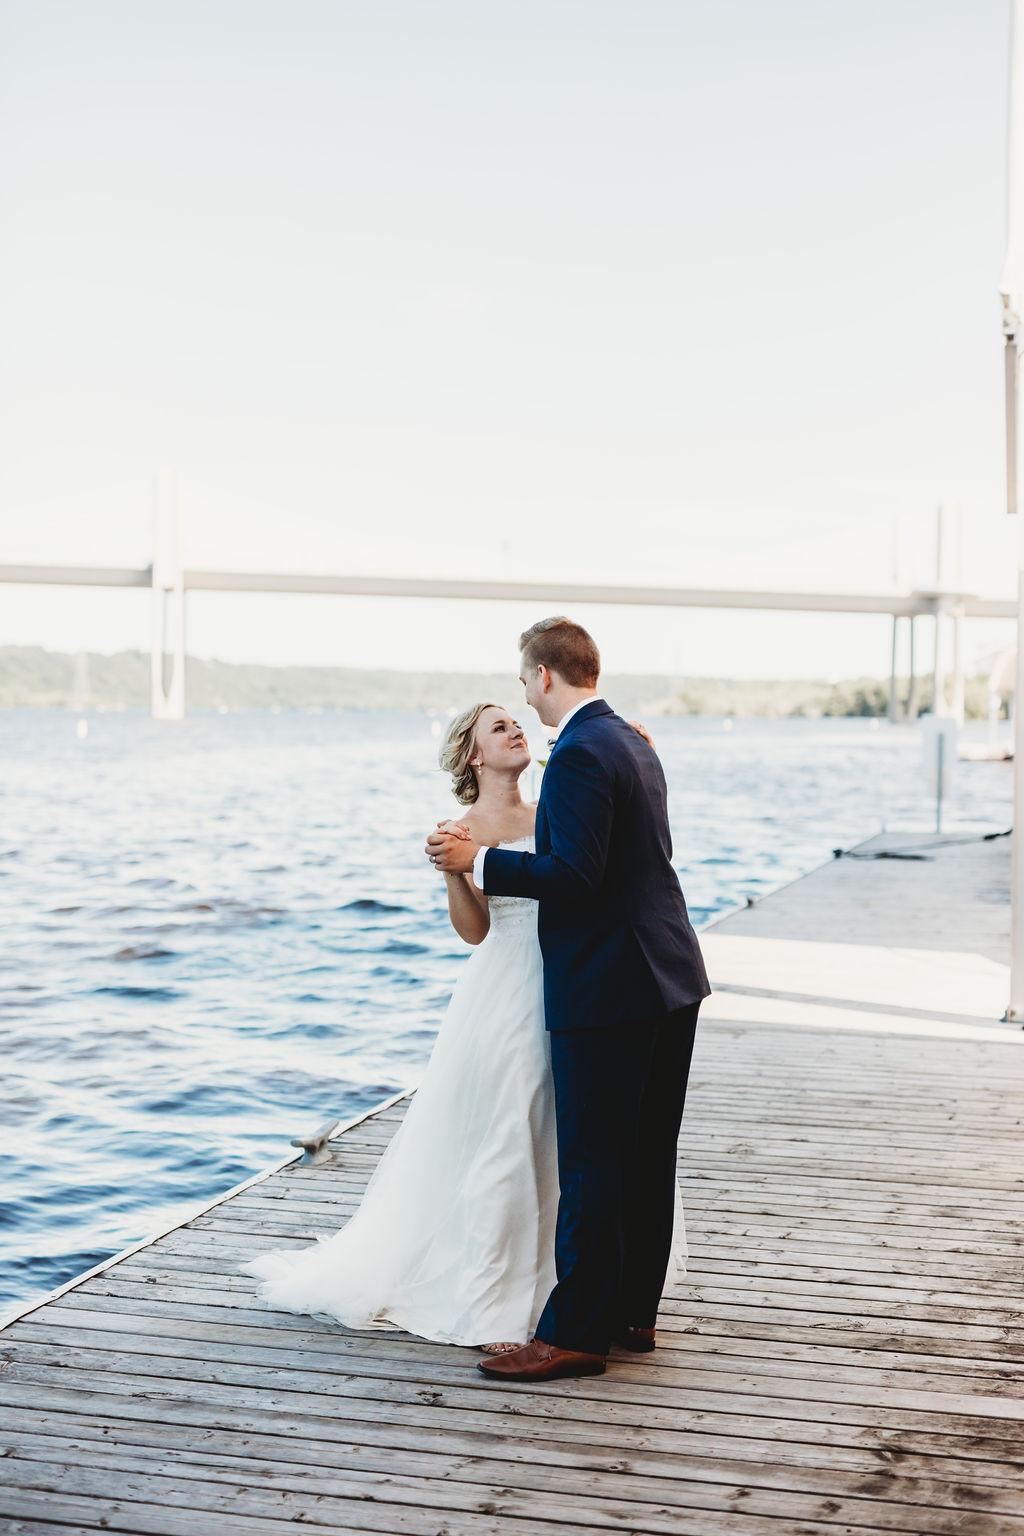 engle-olson-katie-dalton-wedding-clewell-photography-7.jpg